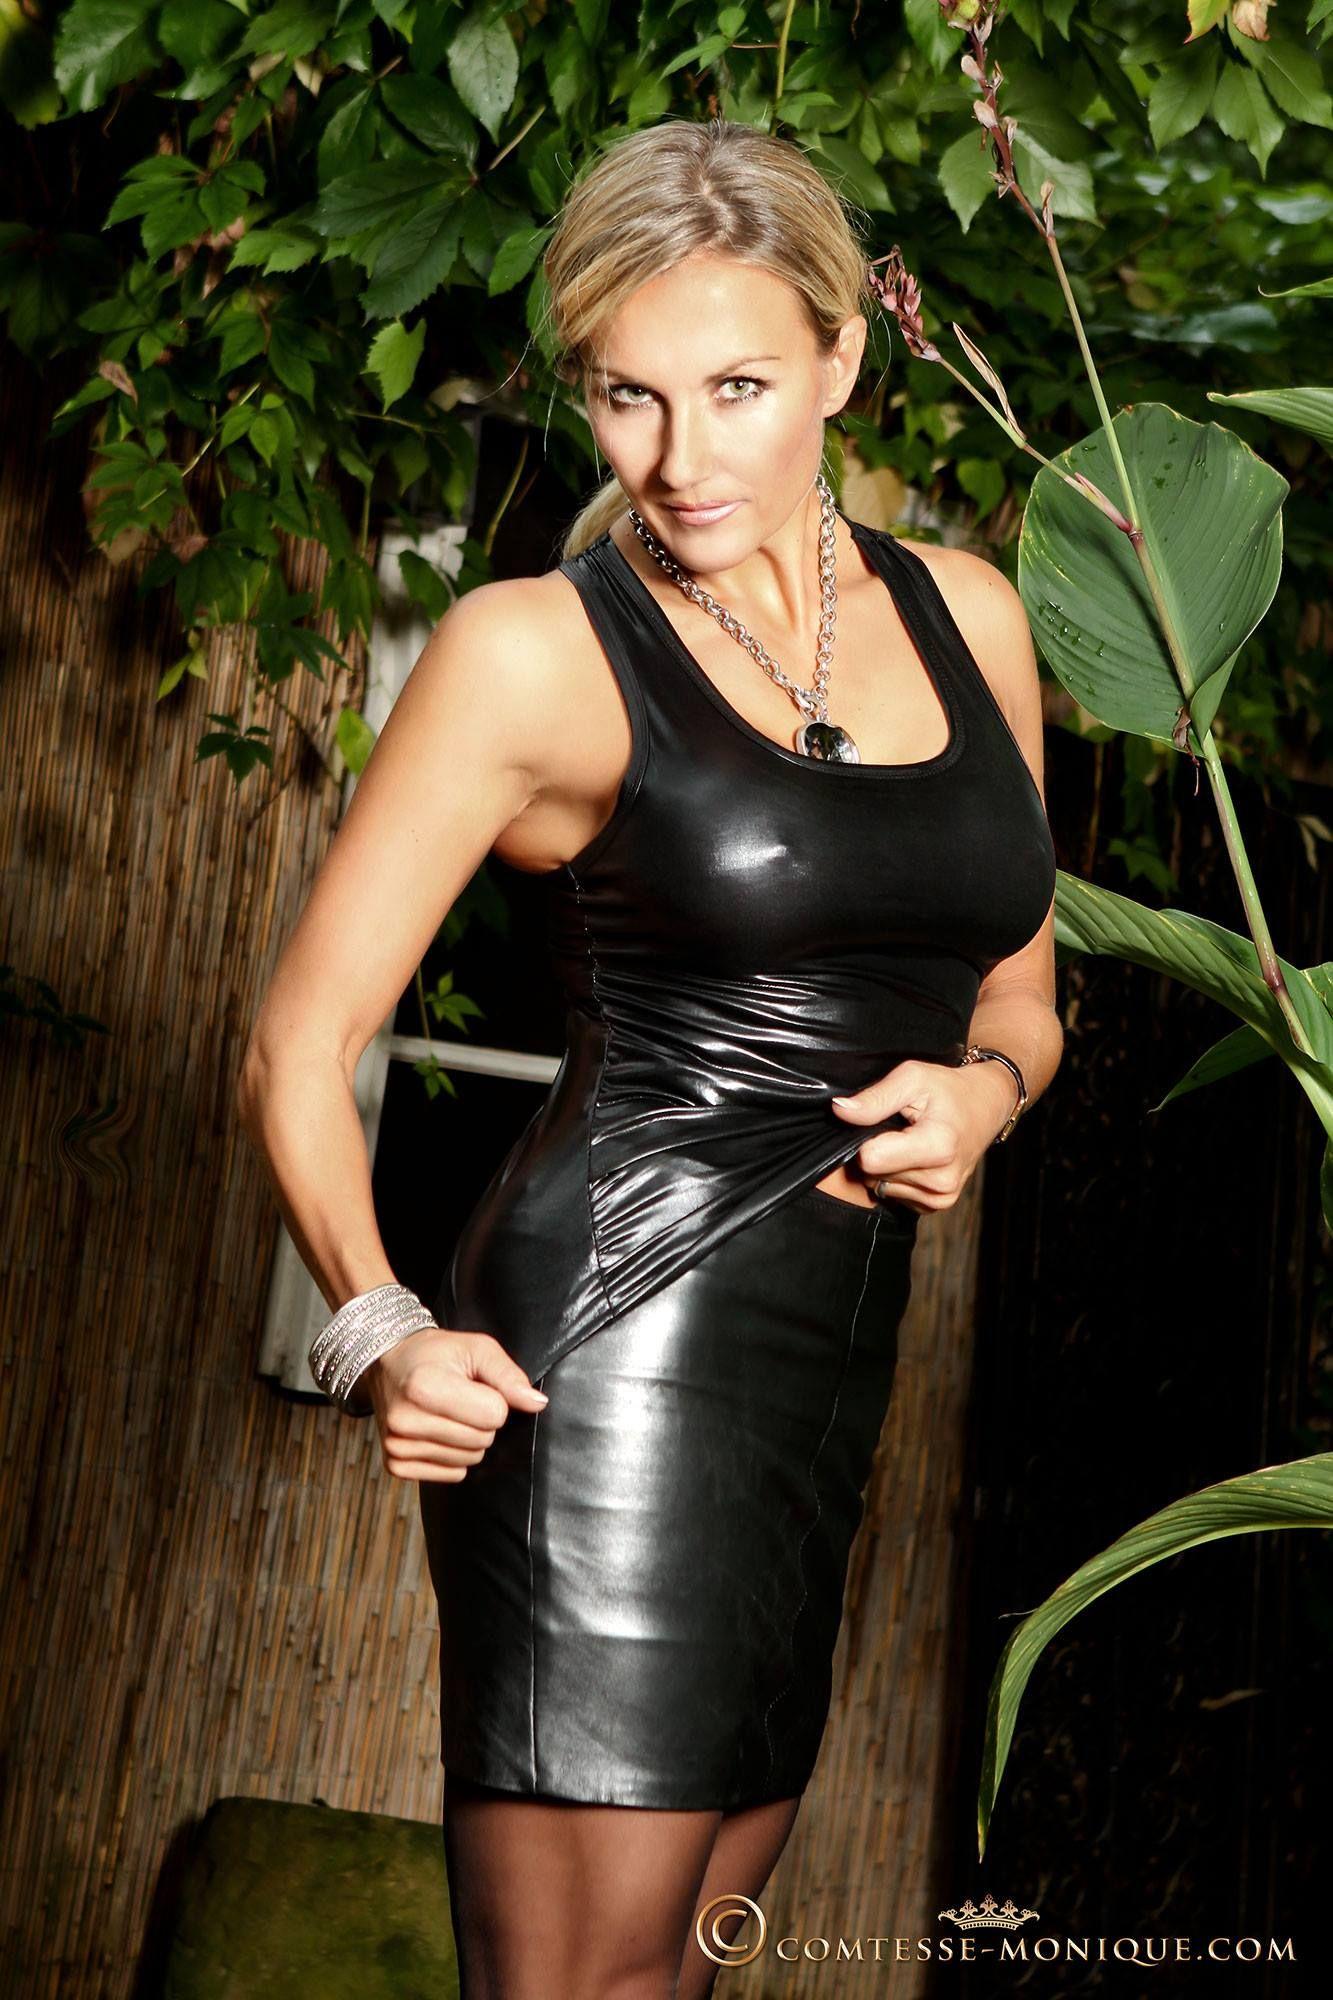 Comtesse Monique Hot Women L Pinterest Leather Latex And Sepatu Wanita Power Galax 5283211